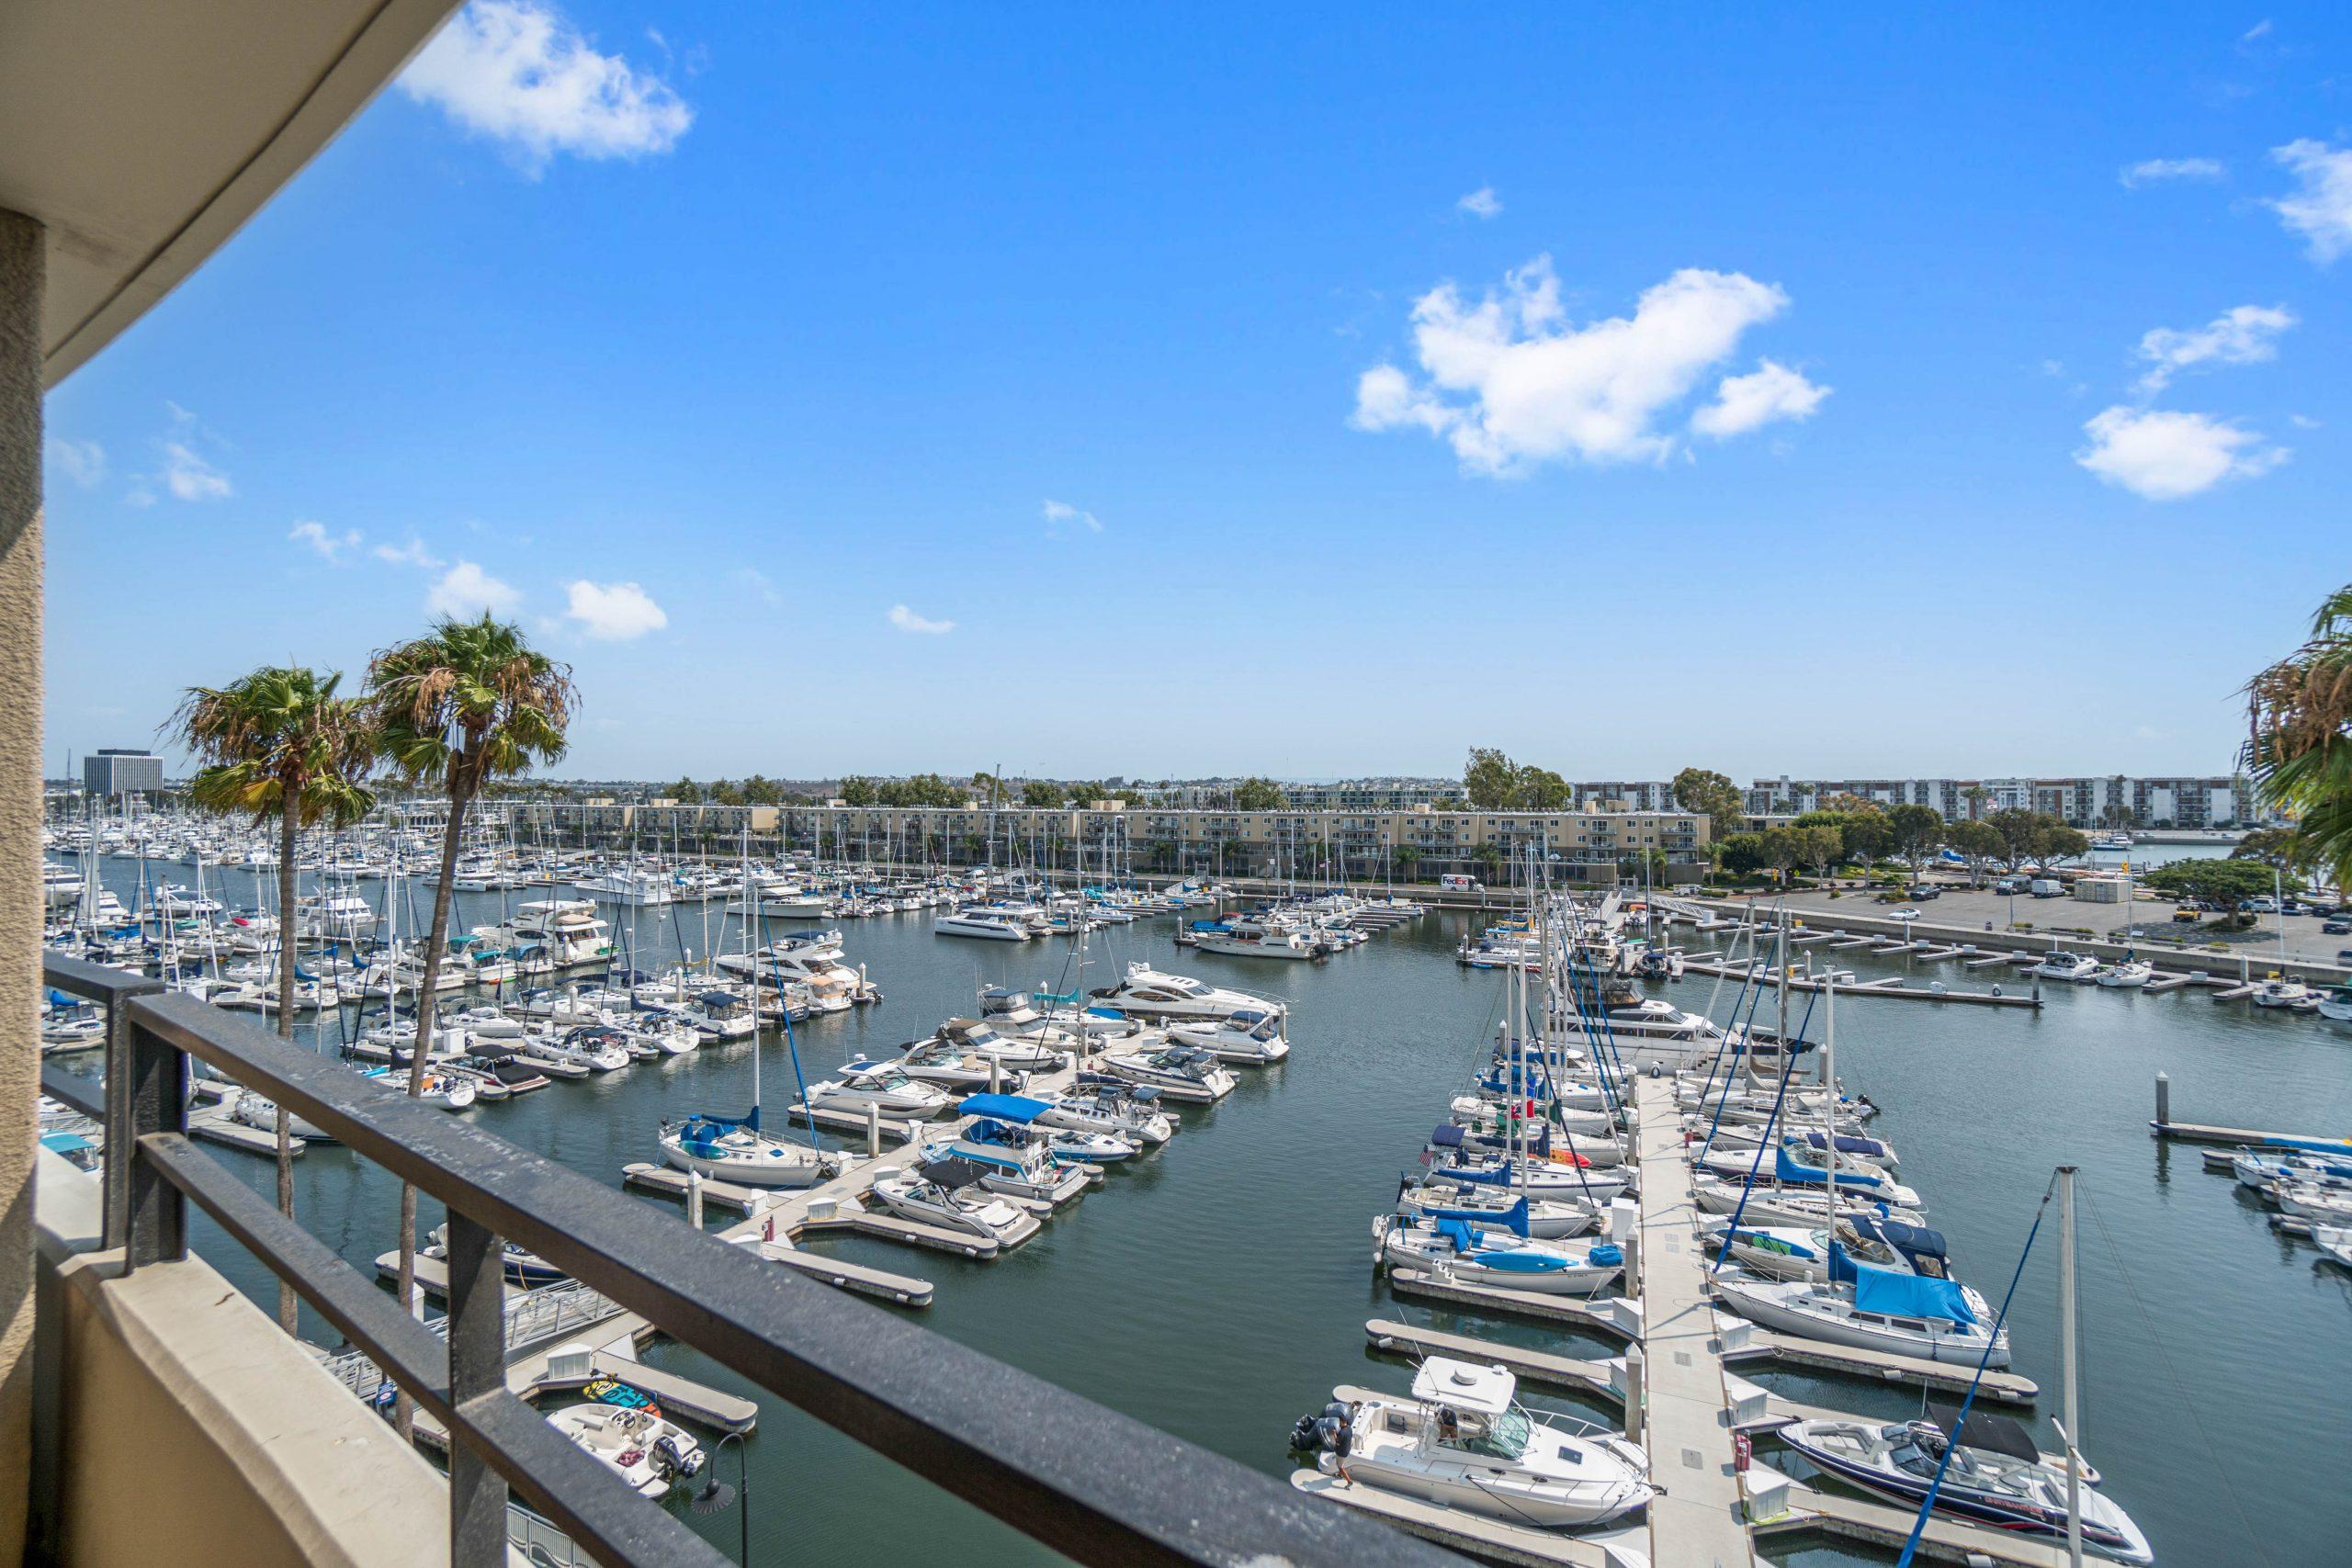 Top 25 (lowest priced) Condos in Marina del Rey